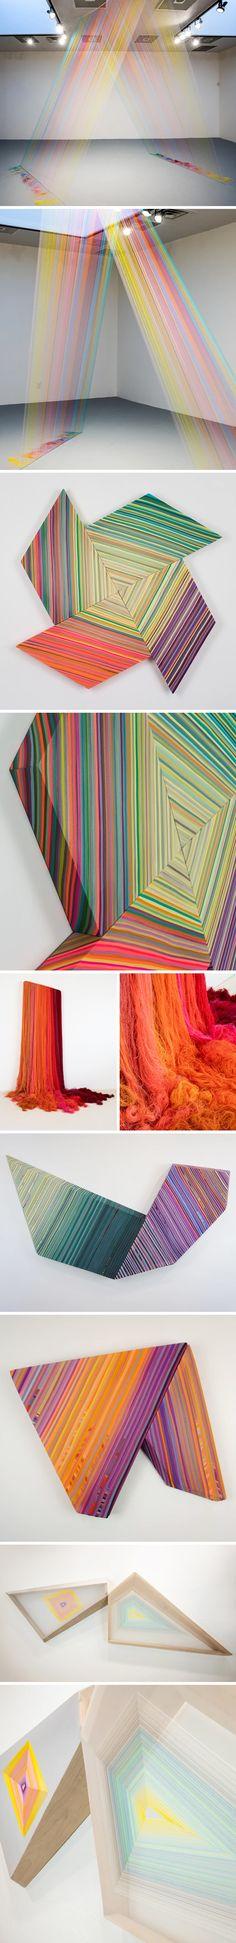 The Jealous Curator /// curated contemporary art /// jen pack Textile Sculpture, Textile Art, Book Of Kells, Textiles, Wow Art, Modern Artists, Installation Art, Art Installations, Beautiful Architecture